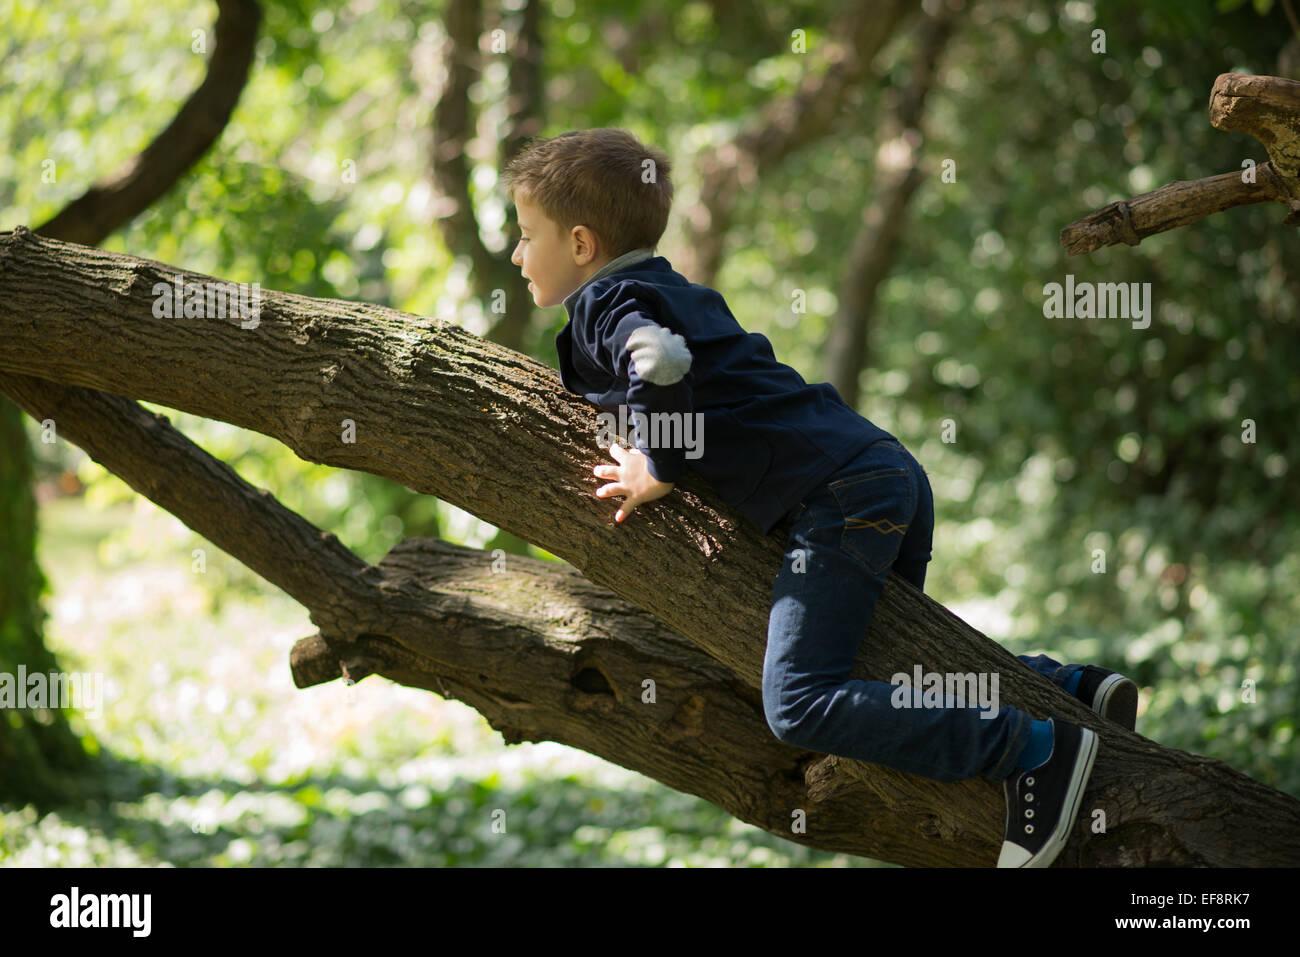 Boy climbing a tree - Stock Image